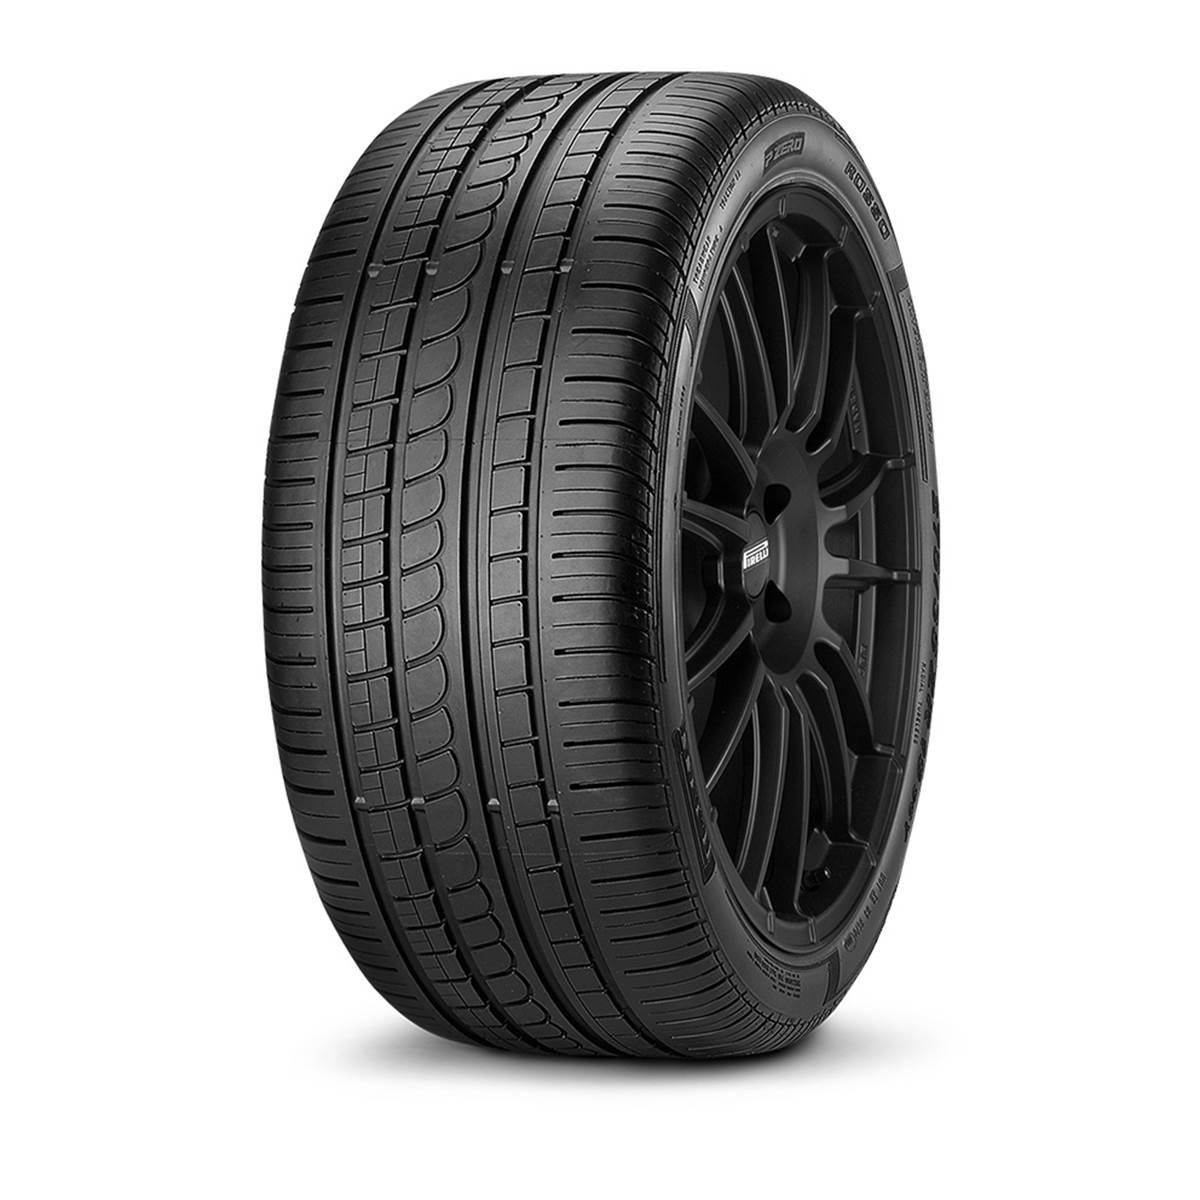 Pneu Pirelli 235/45R18 98Y Pzero Nero (Gt) XL